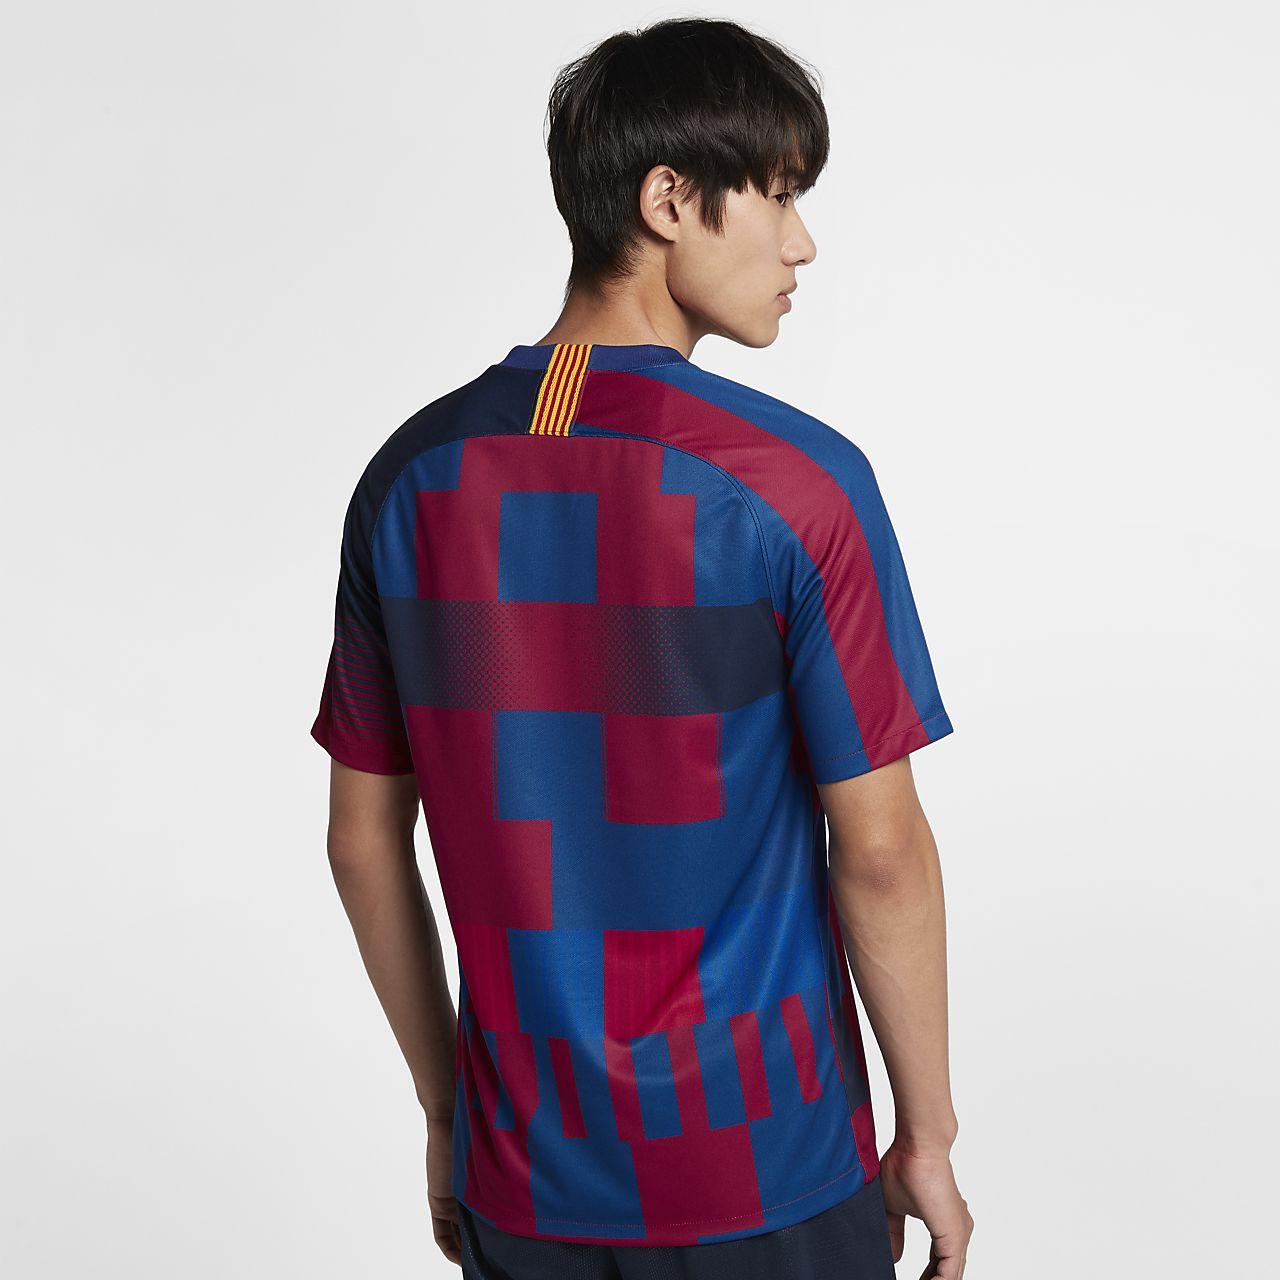 692b03564 FC Barcelona 20th Anniversary Men s Shirt. Nike.com ZA